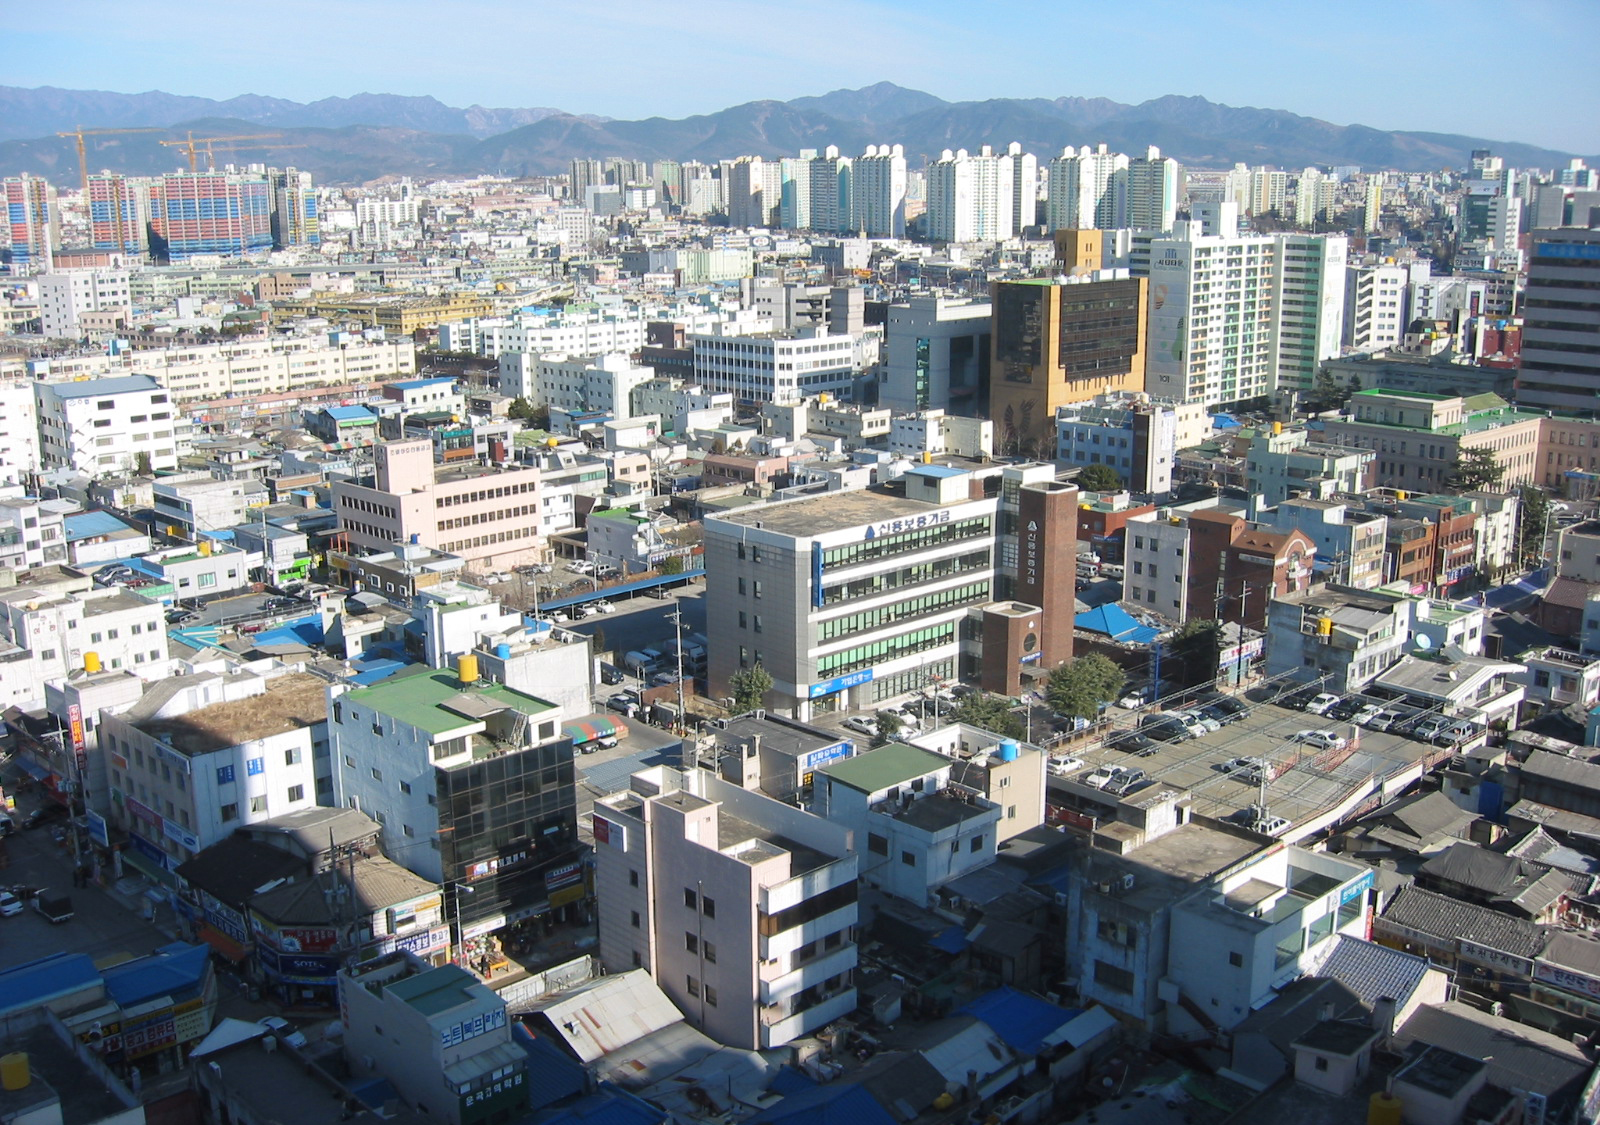 kinh nghiệm du lịch Daegu